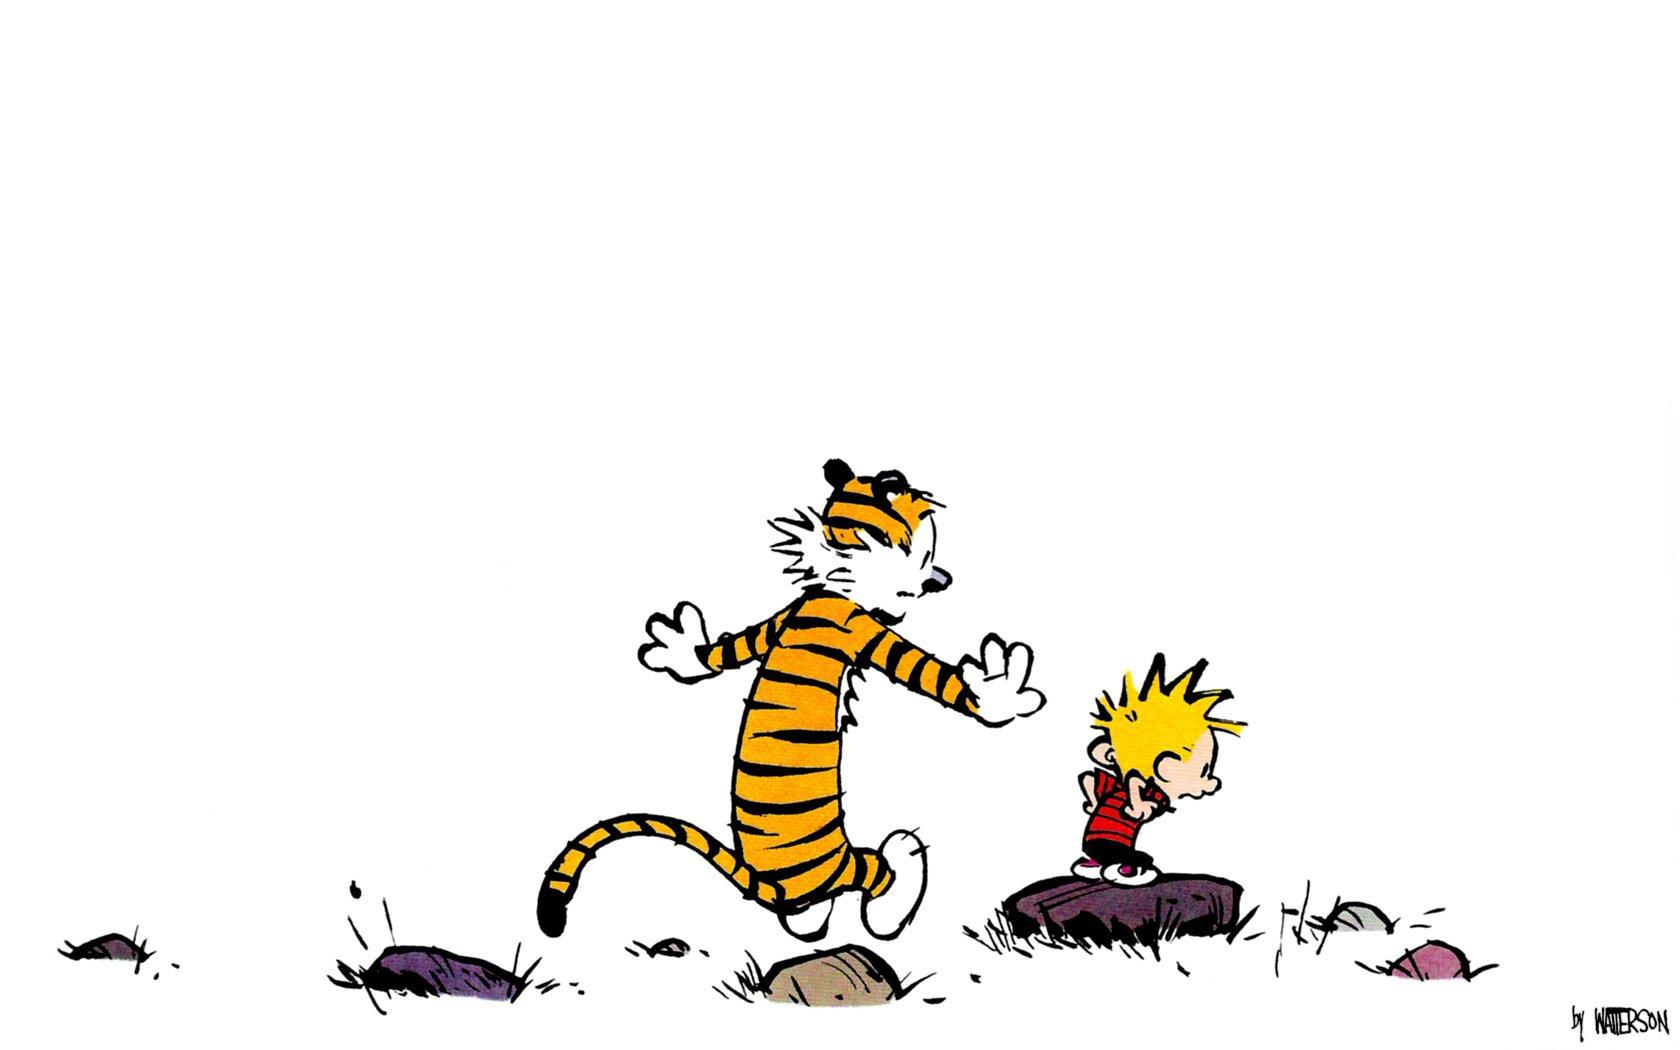 Calvin and Hobbes: All Grown Up [Street Art]